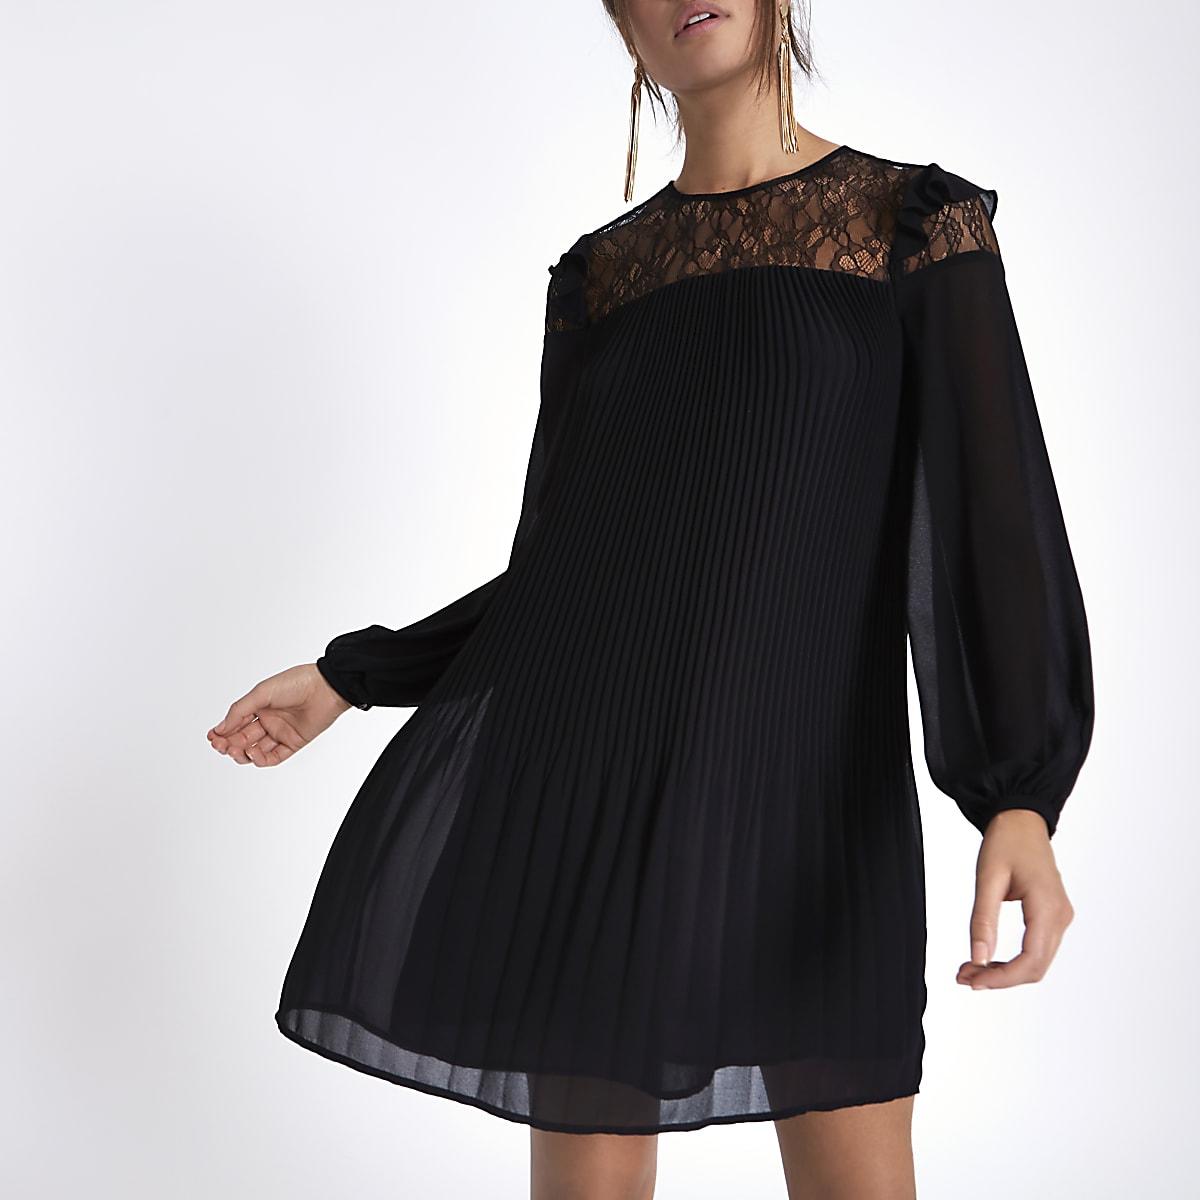 Black pleated lace frill swing dress